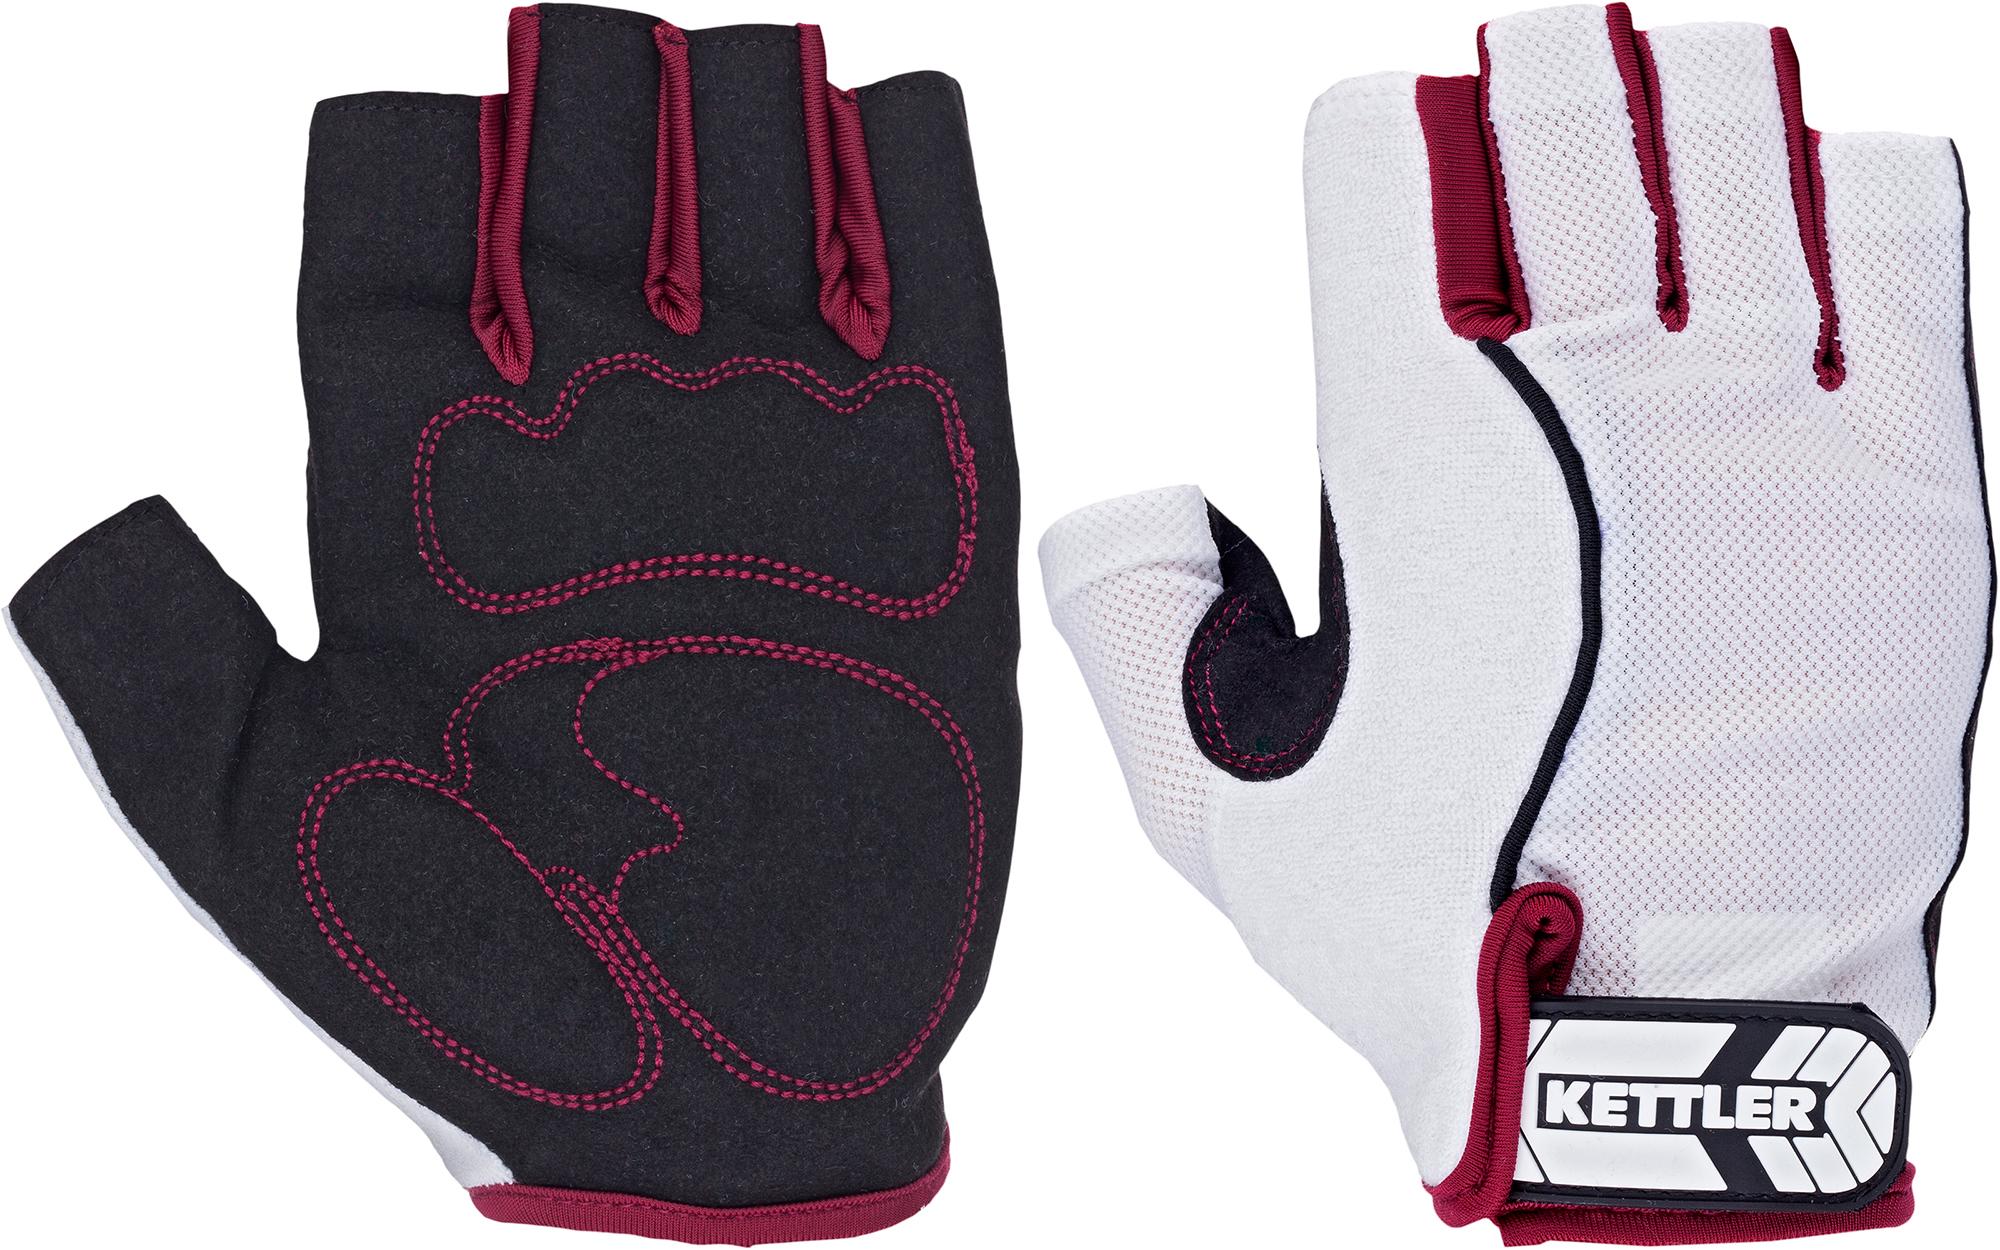 Kettler Перчатки для фитнеса женские Kettler Basic перчатки для фитнеса мужские kettler basic kettler